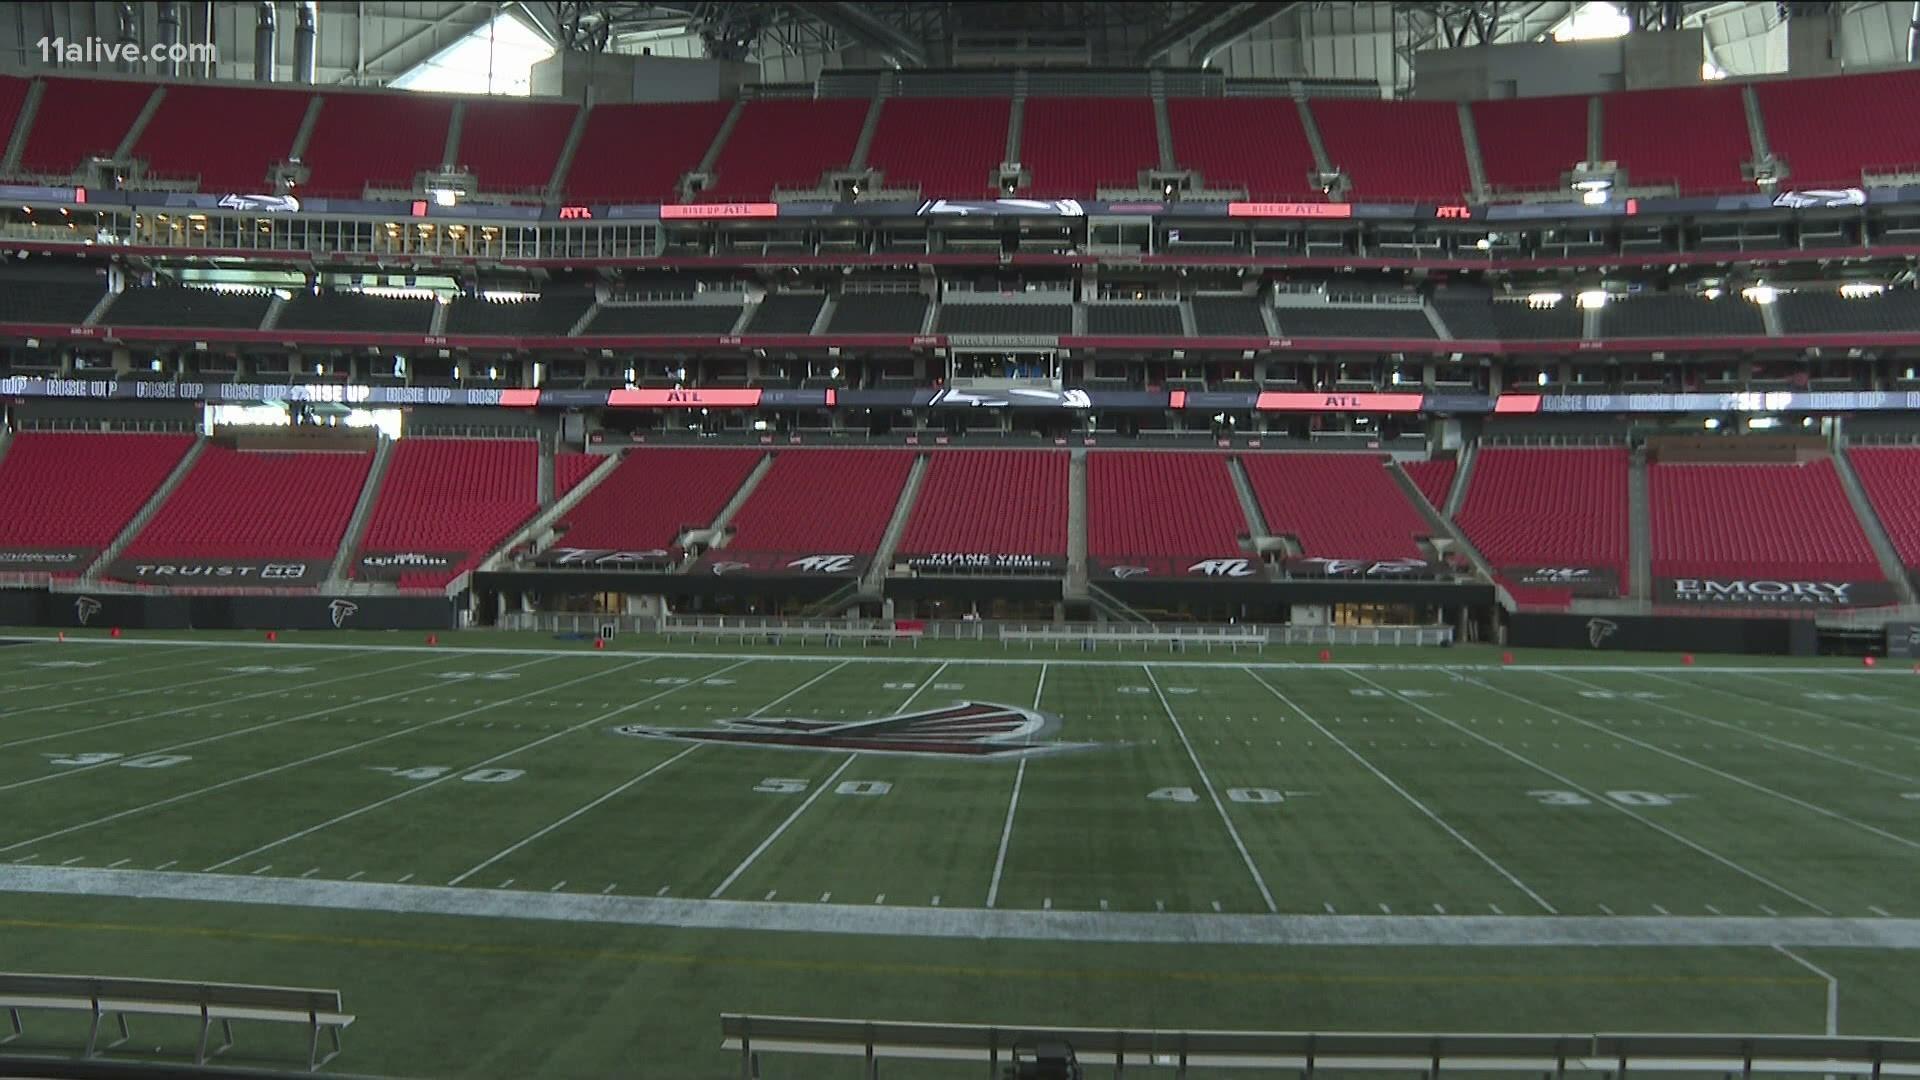 Empty Seats To Greet Atlanta Falcons At First Games 11alive Com